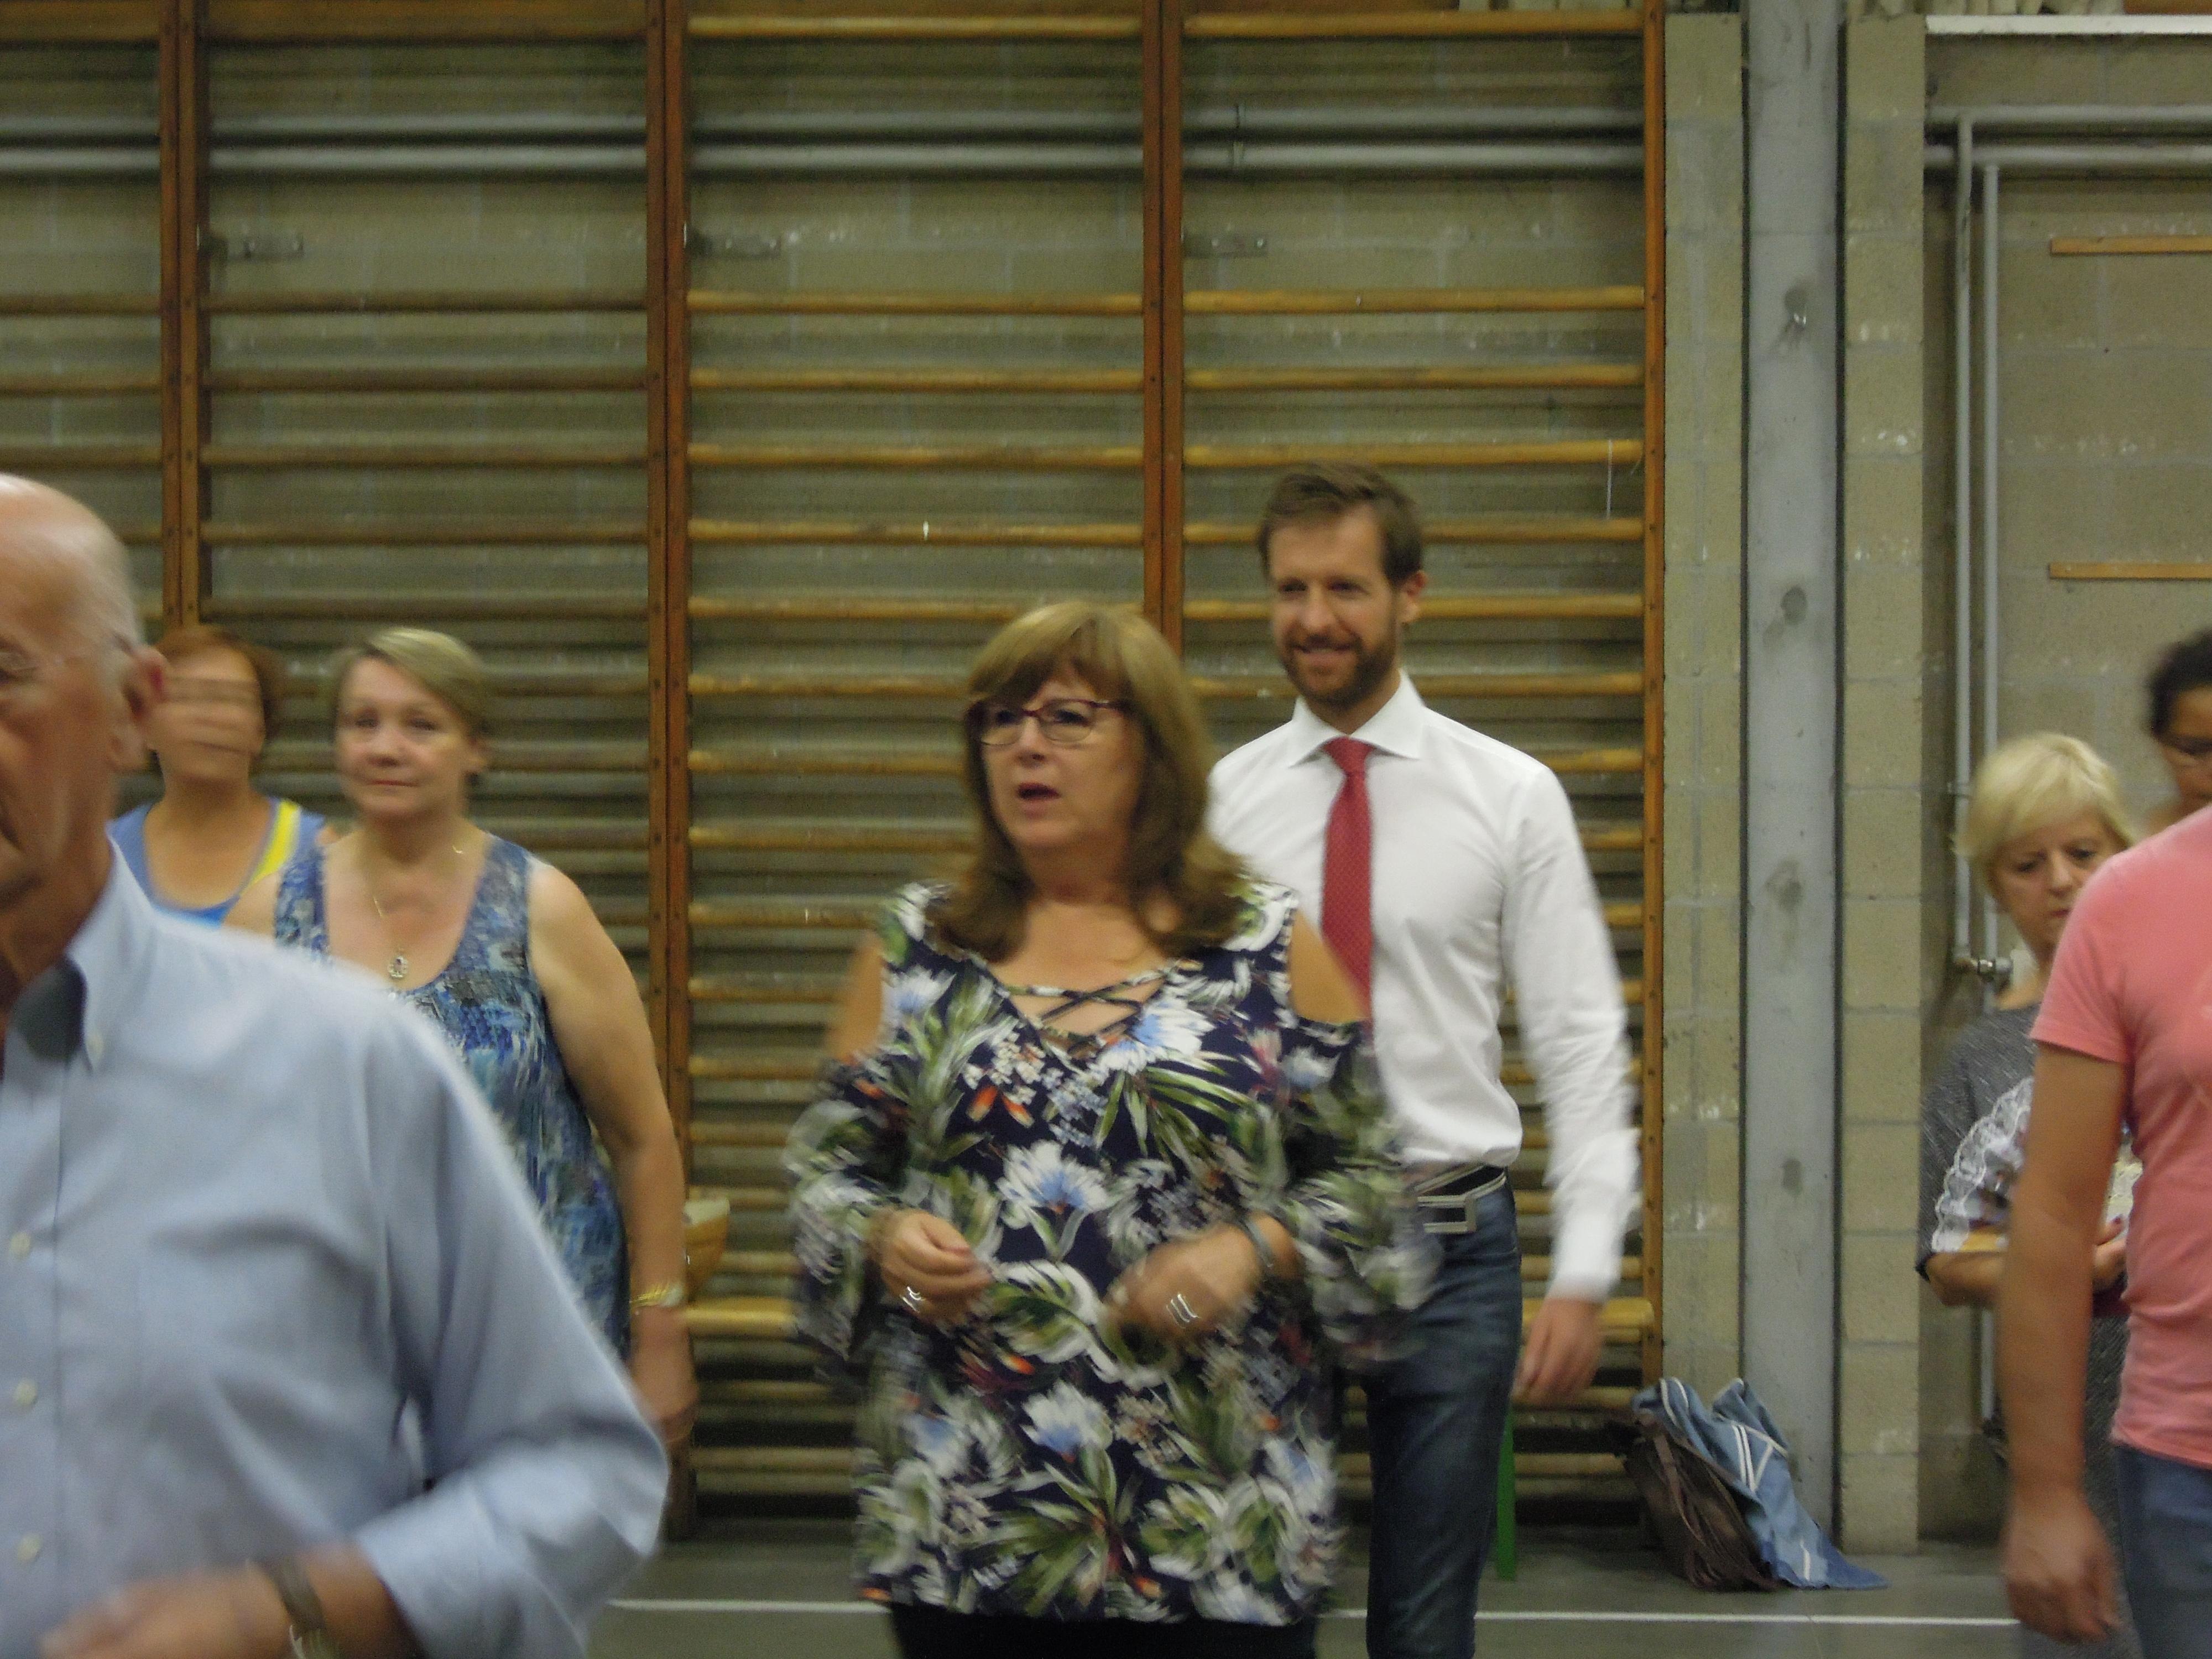 Et si Mons dansait - Club danse Mons - PO 2018-09-10 - Nicolas Martin